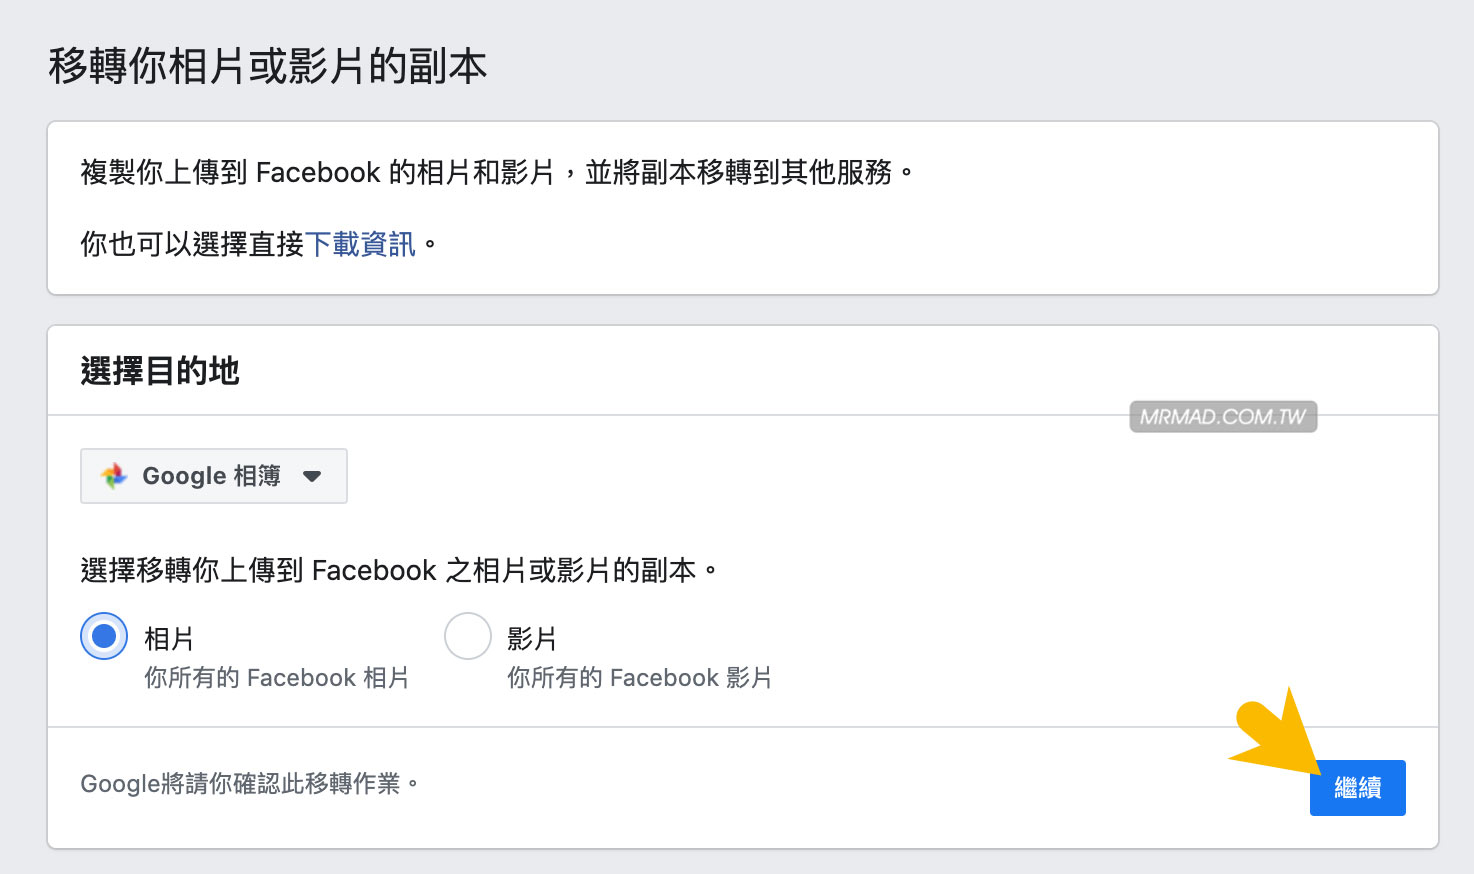 FB相簿下載搬家技巧。教你一鍵打包下載、轉移Google相簿 - 瘋先生